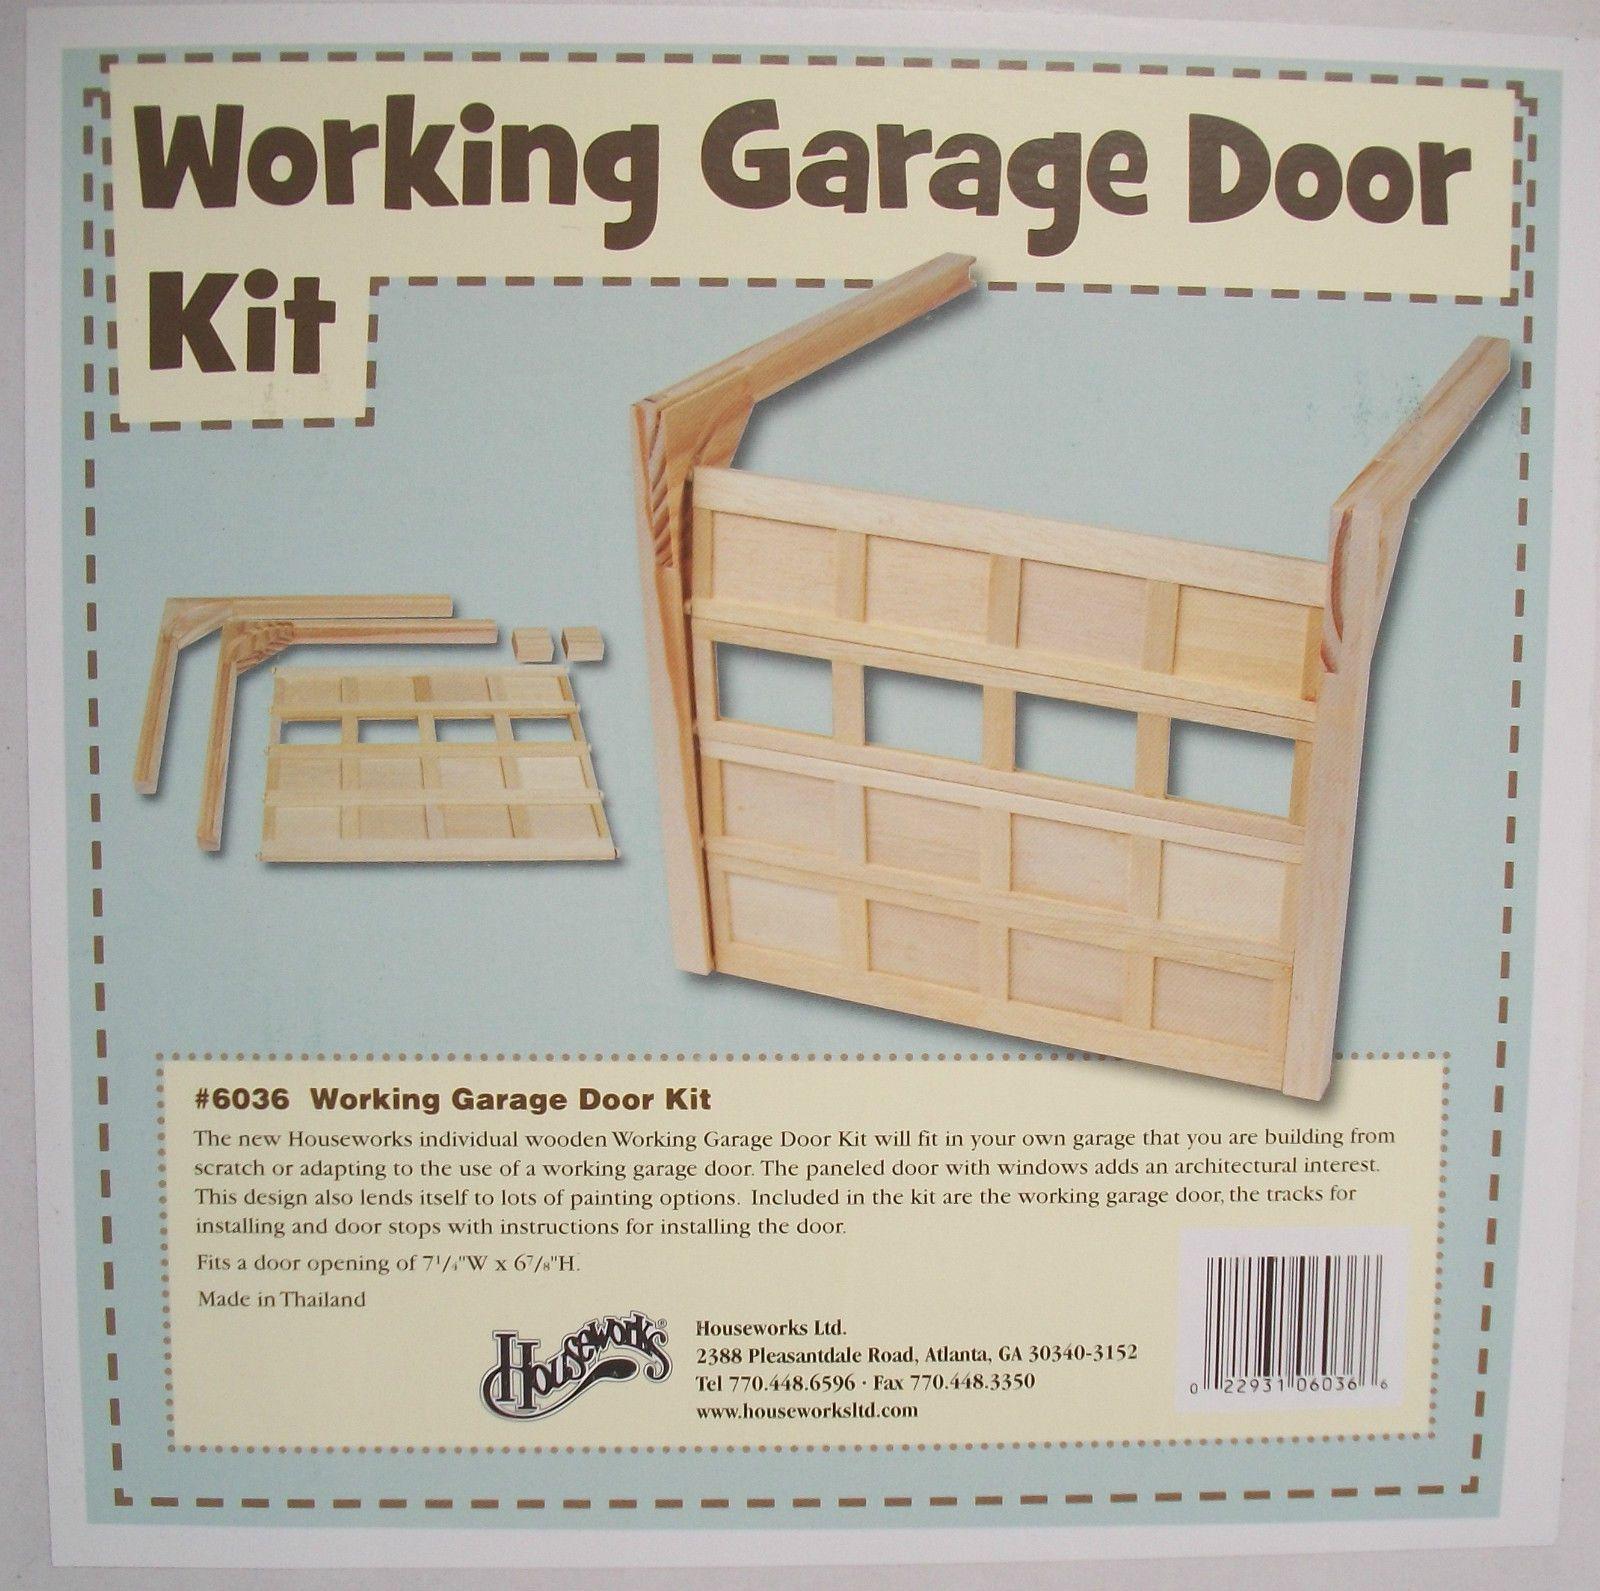 Garage Door working Kit 6036 dollhouse miniature 1 12 scale Houseworks wood